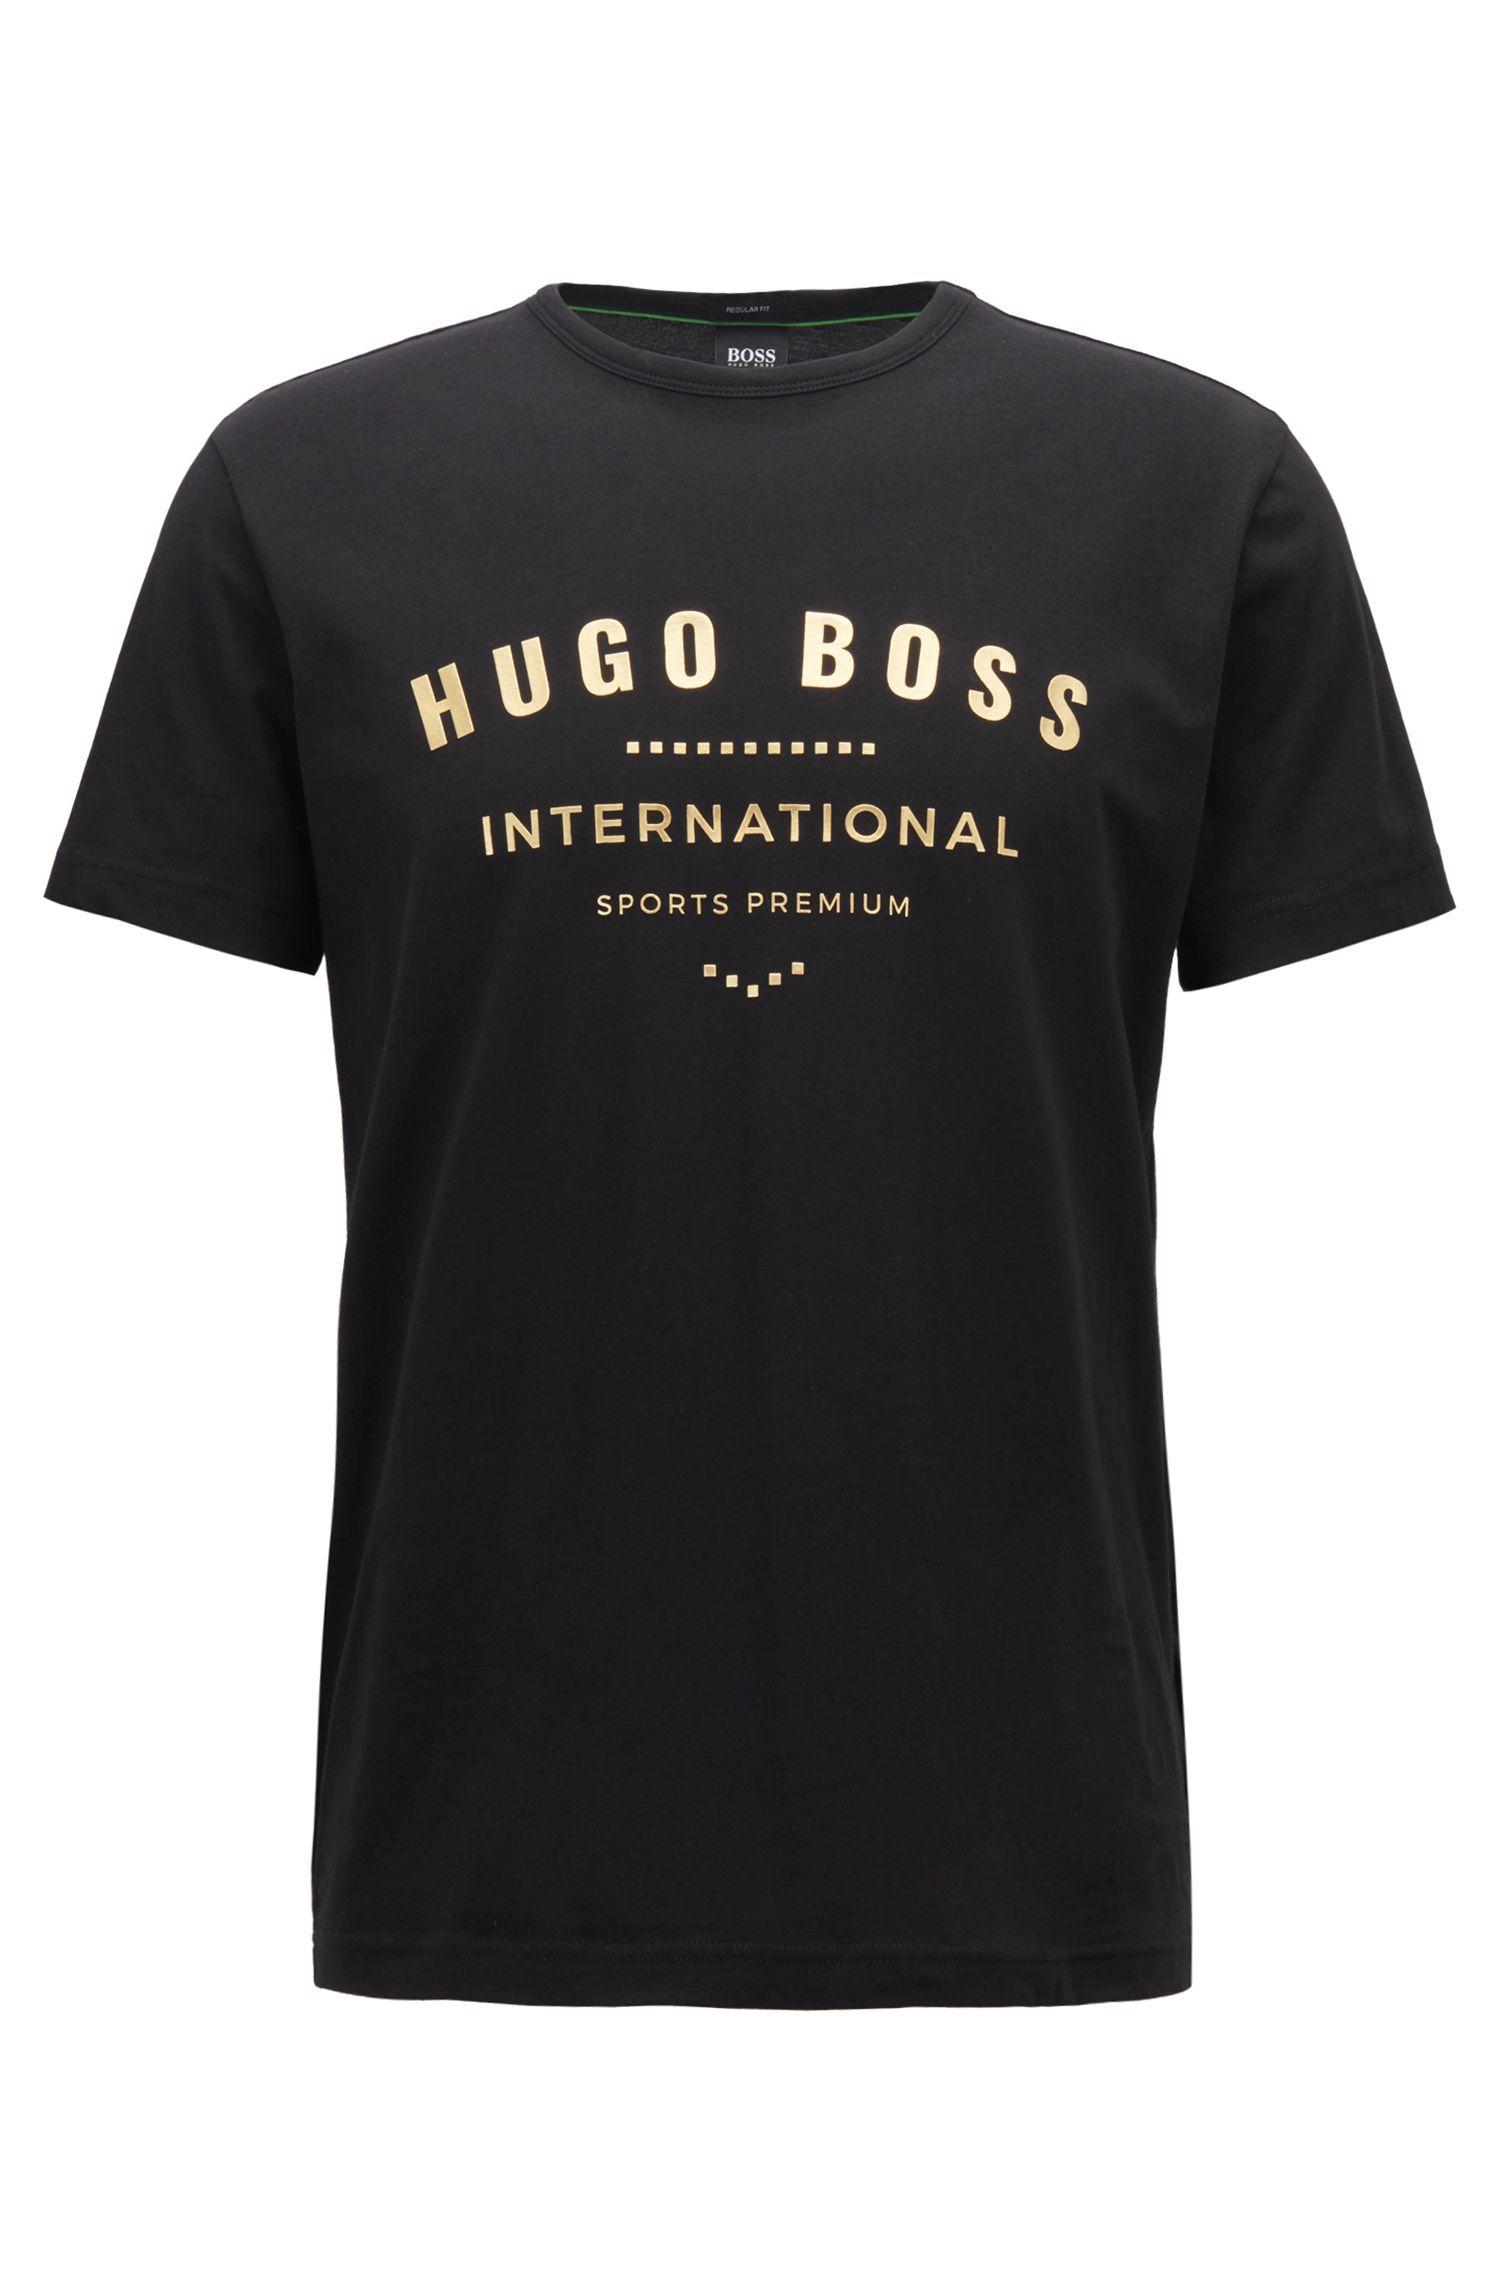 Crew-neck T-shirt in cotton with metallic artwork, Black